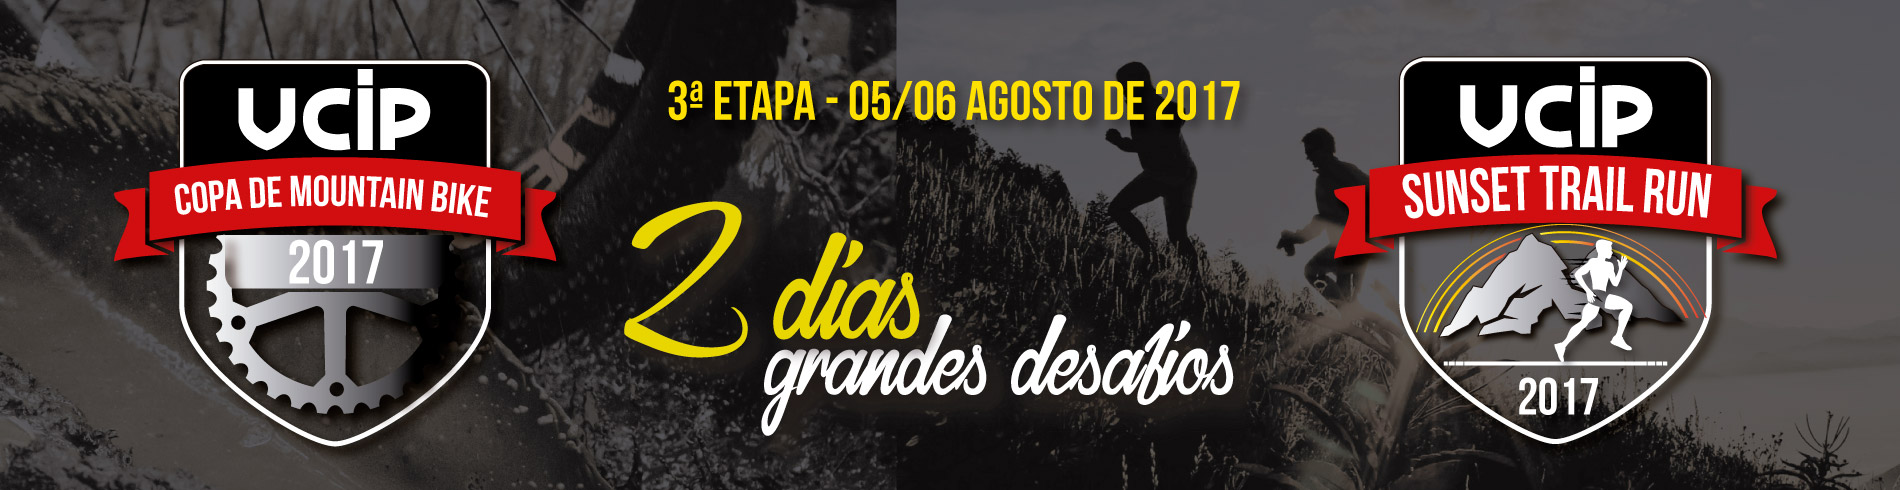 COPA UCIP DE MOUNTAIN BIKE - 3ª ETAPA 2017 - Imagem de topo